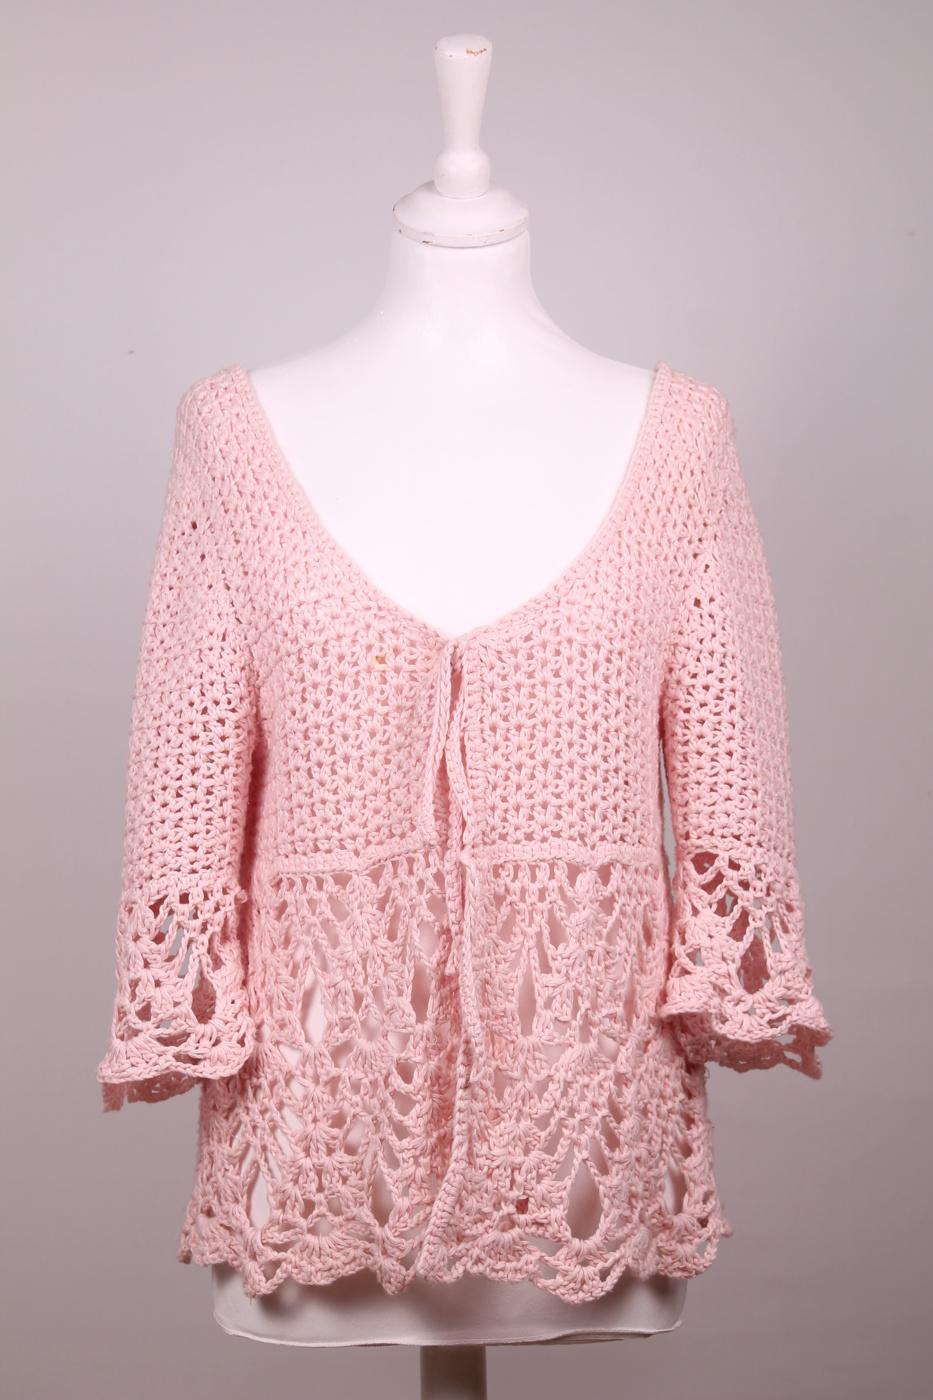 10.Toscana cotton